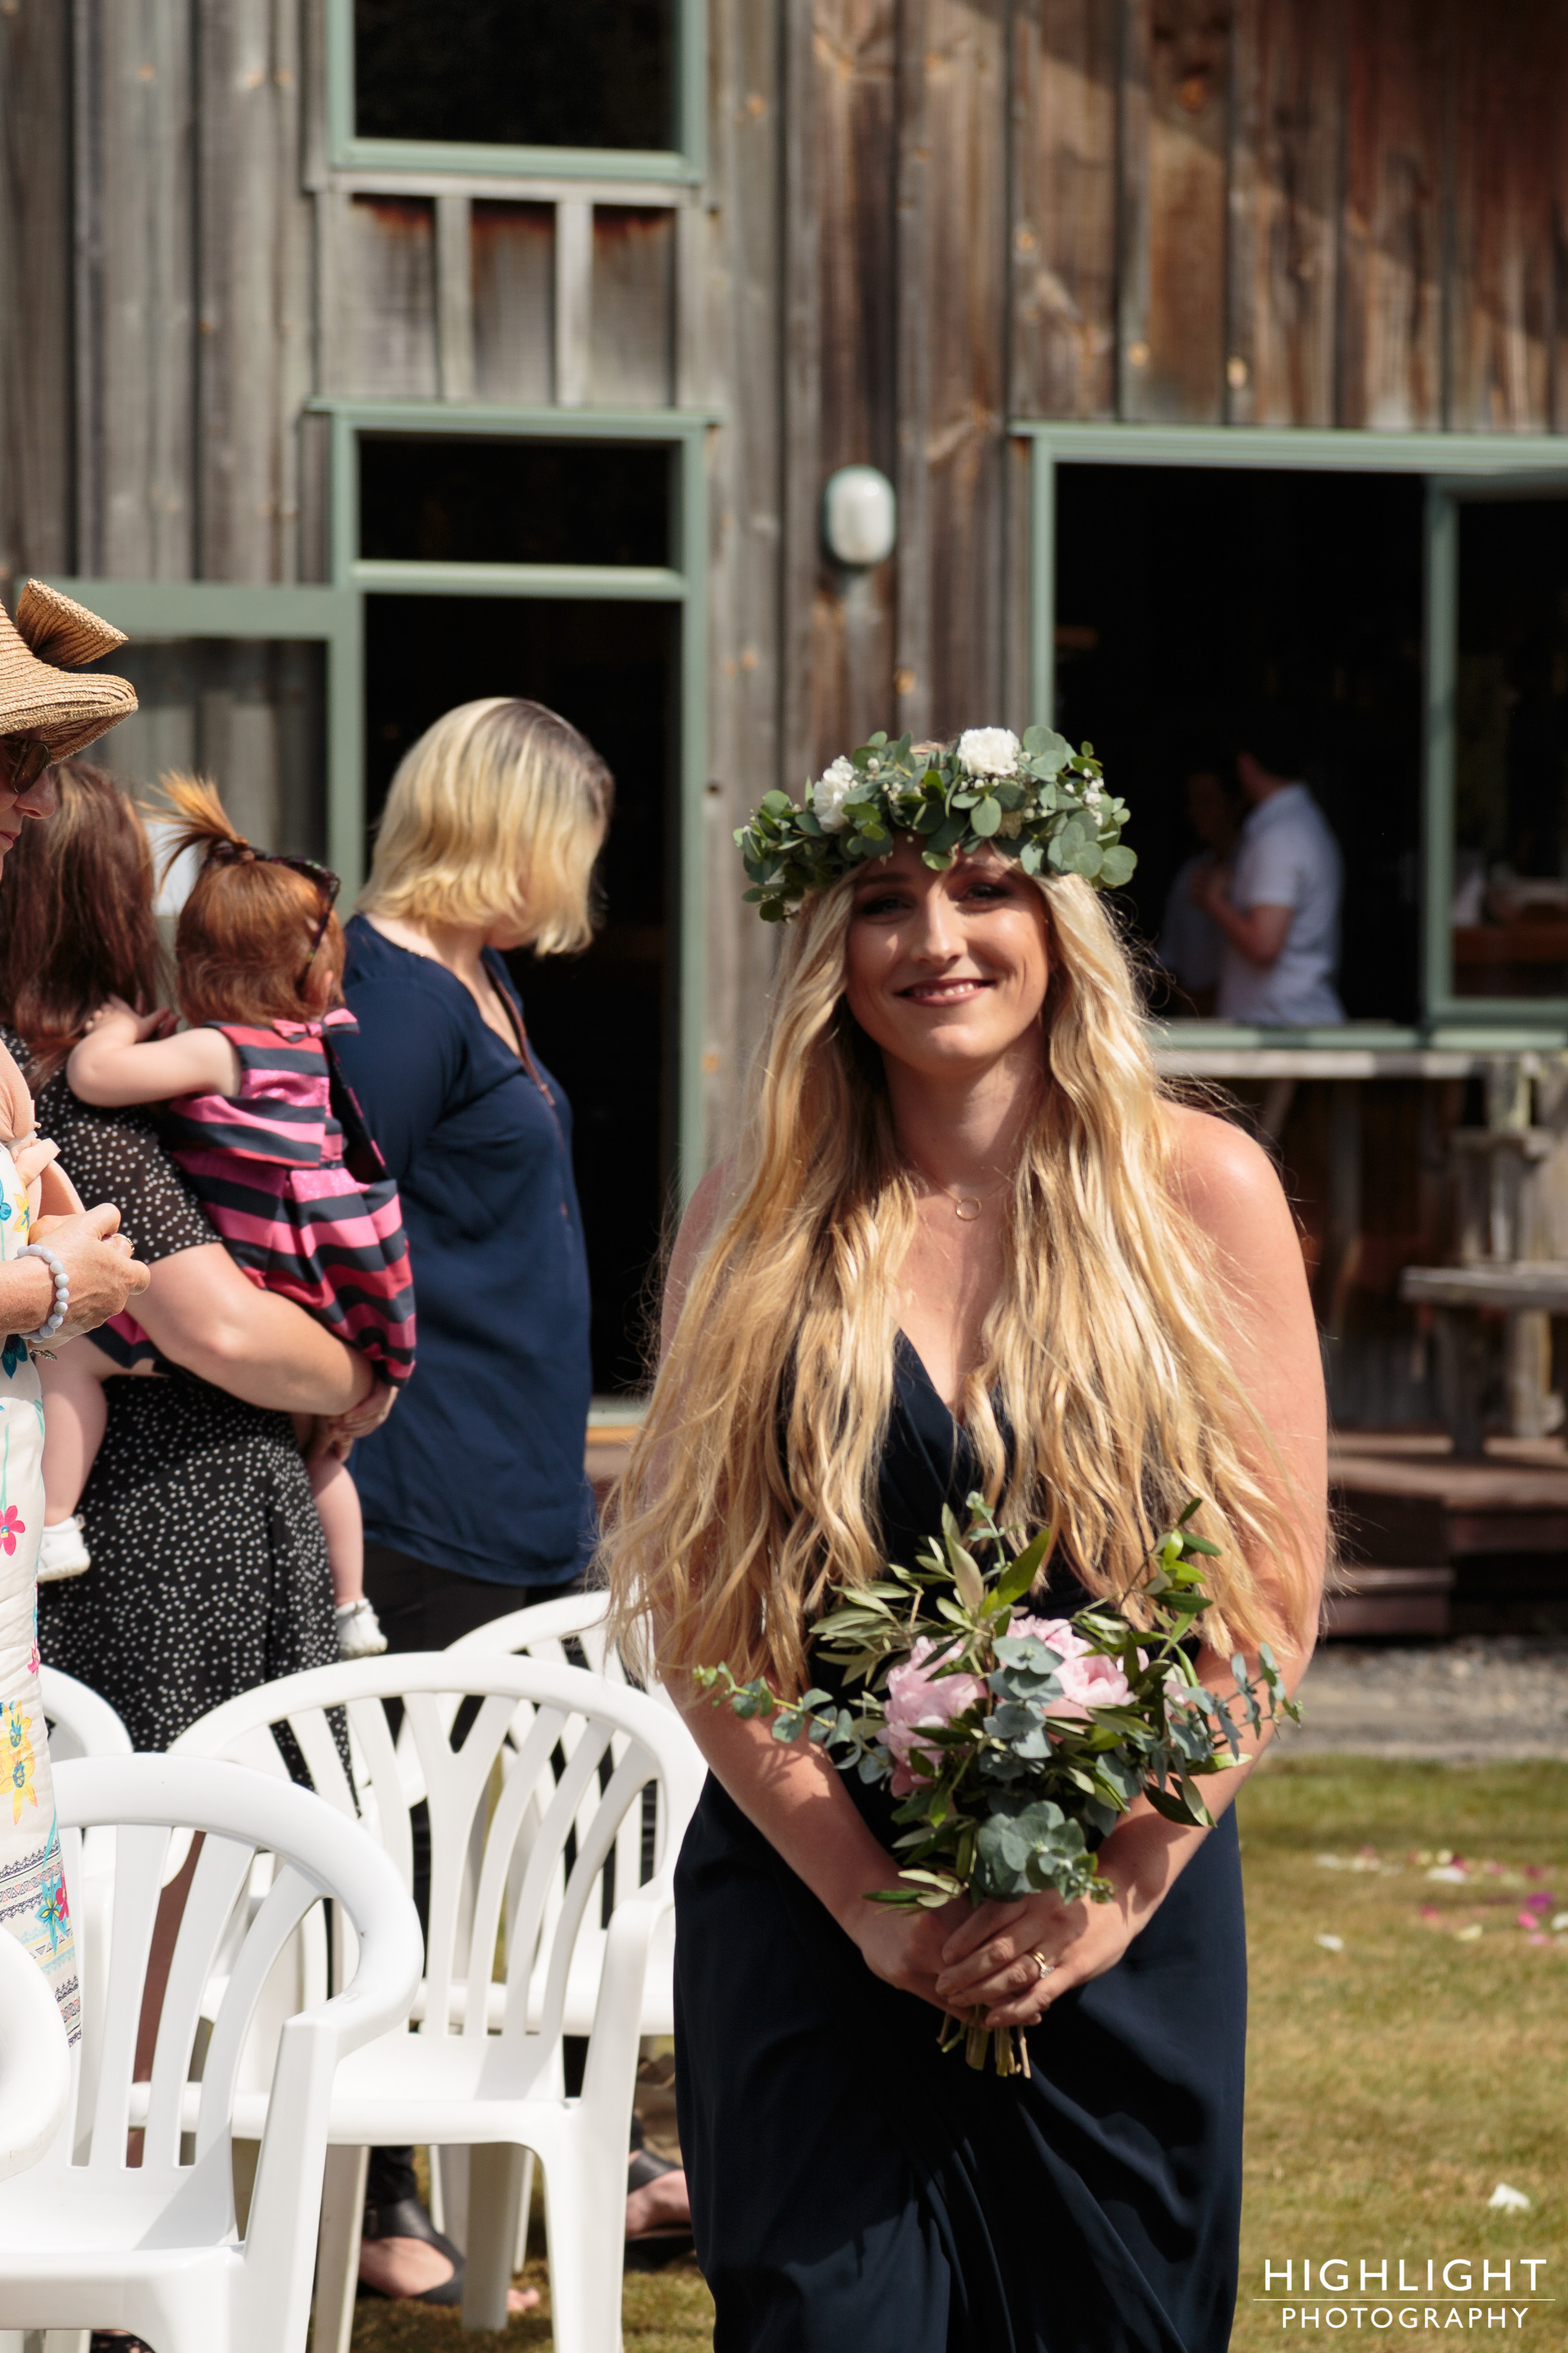 highlight-wedding-photography-new-zealand-makoura-lodge-wedding-55.jpg